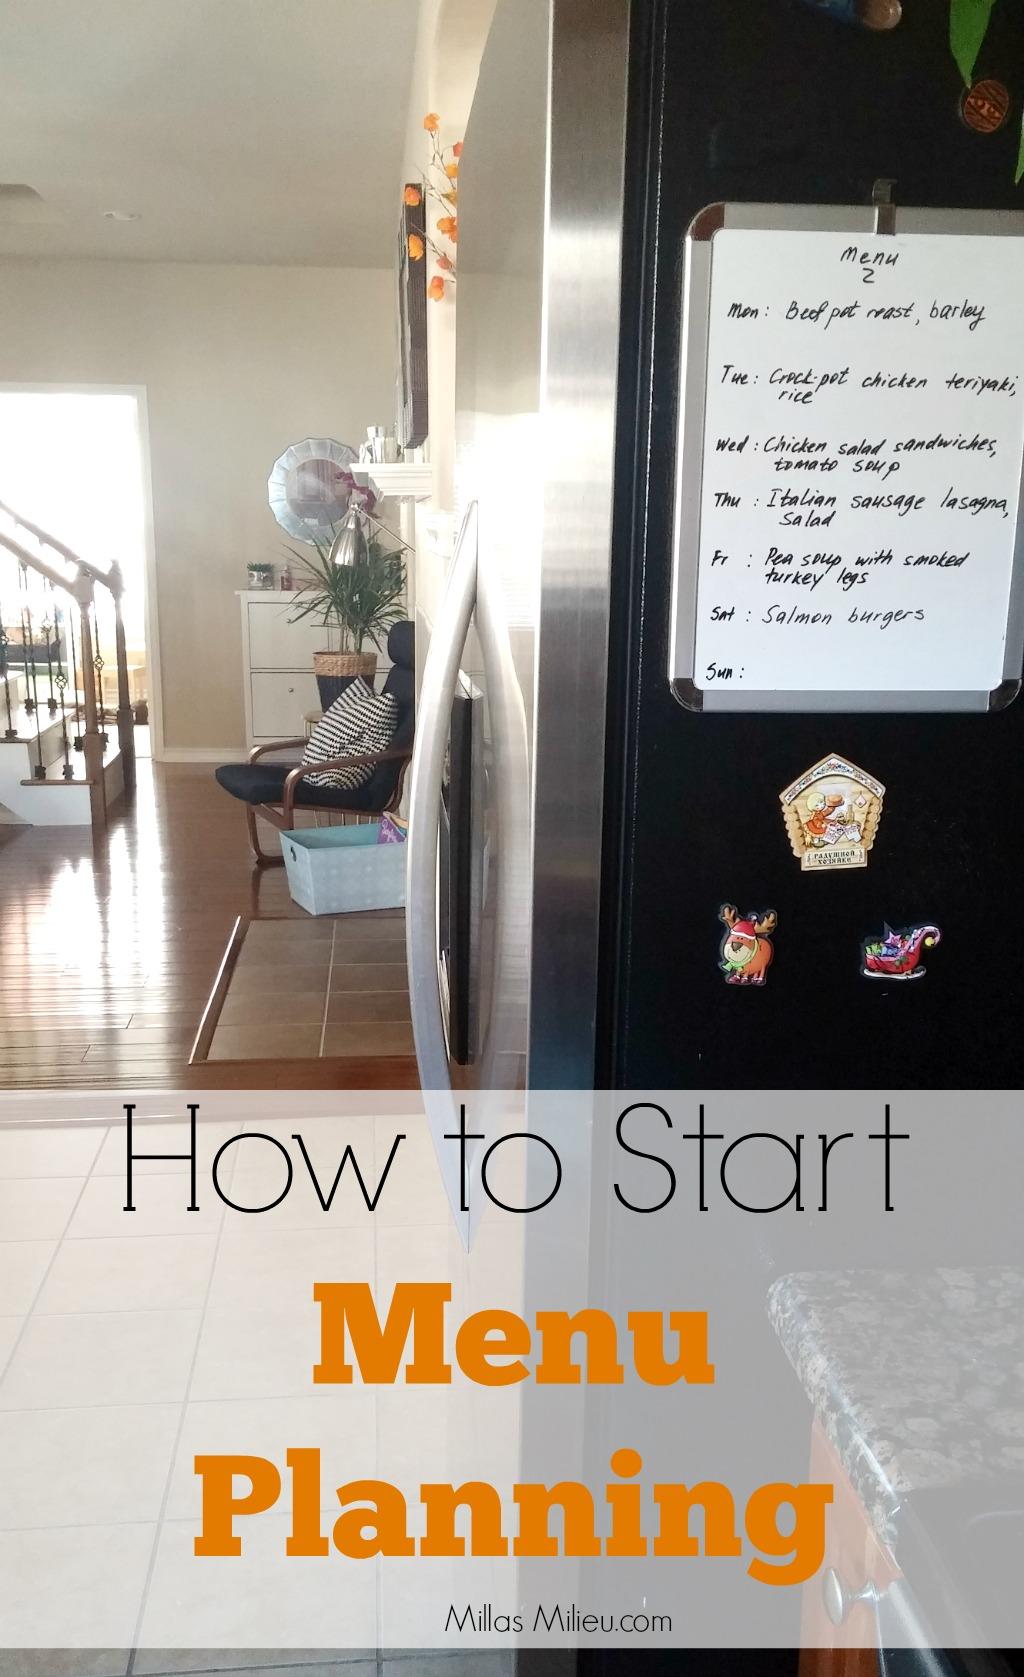 How to start menu planning